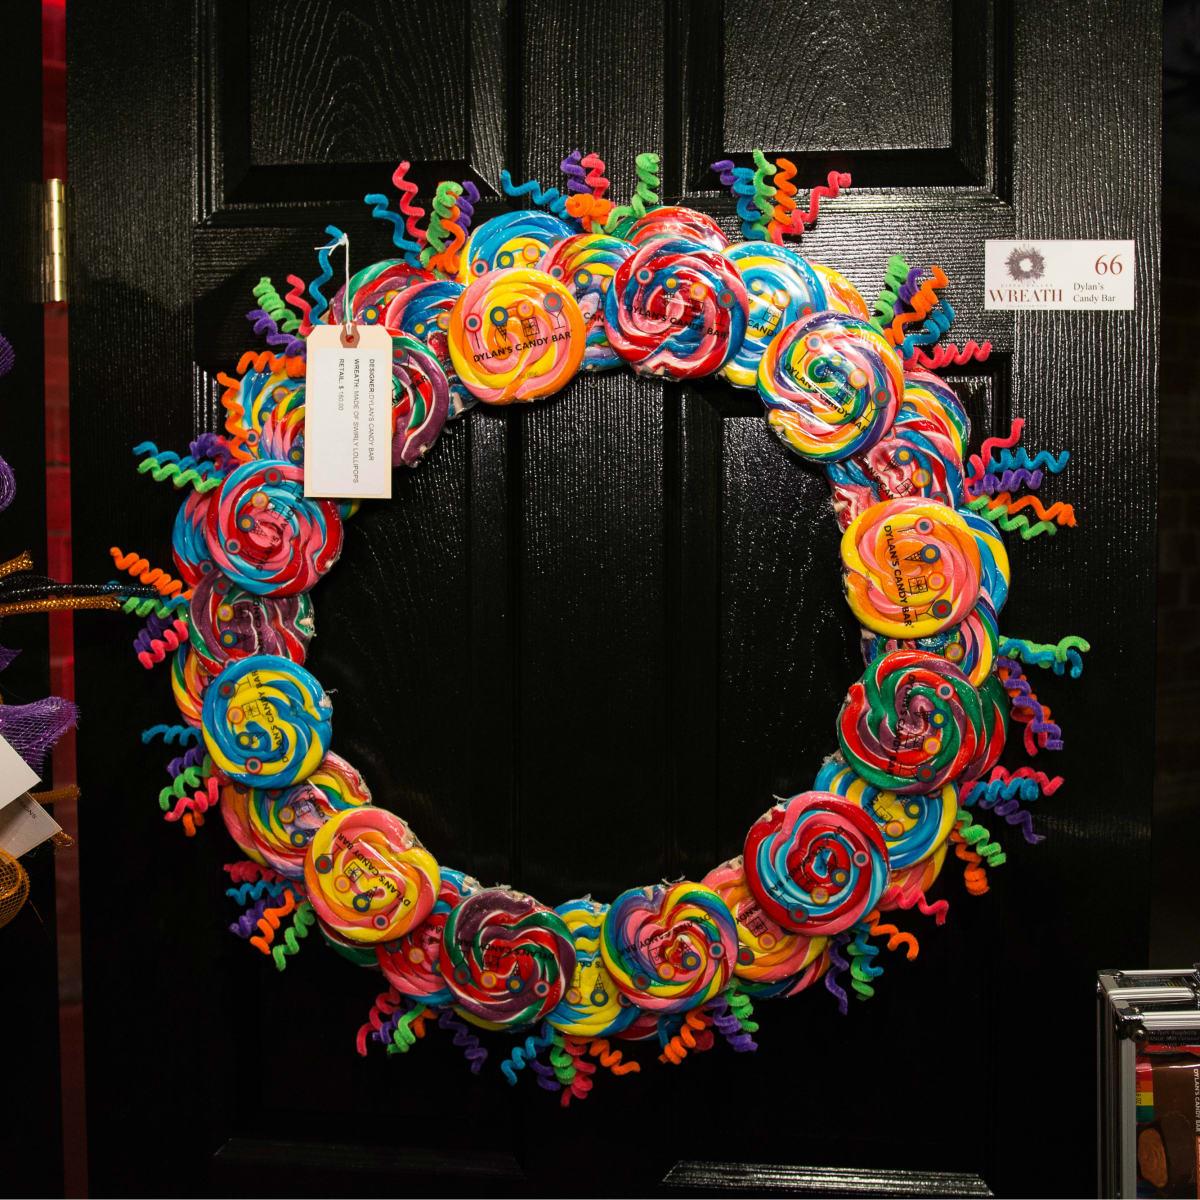 DIFFA/Dallas Holiday Wreath Collection 2016